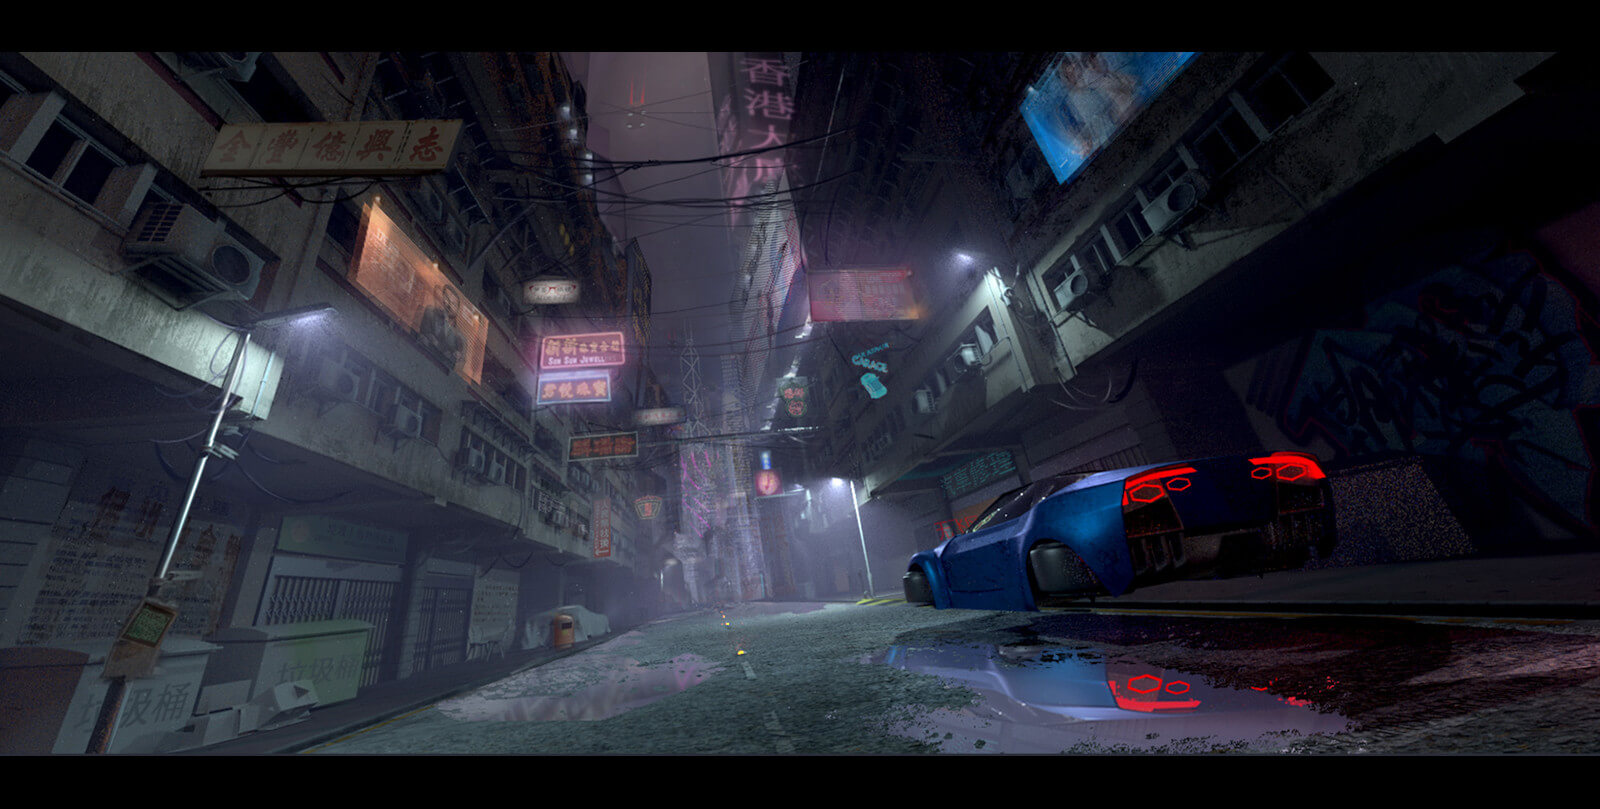 Concept art - futuristic city street